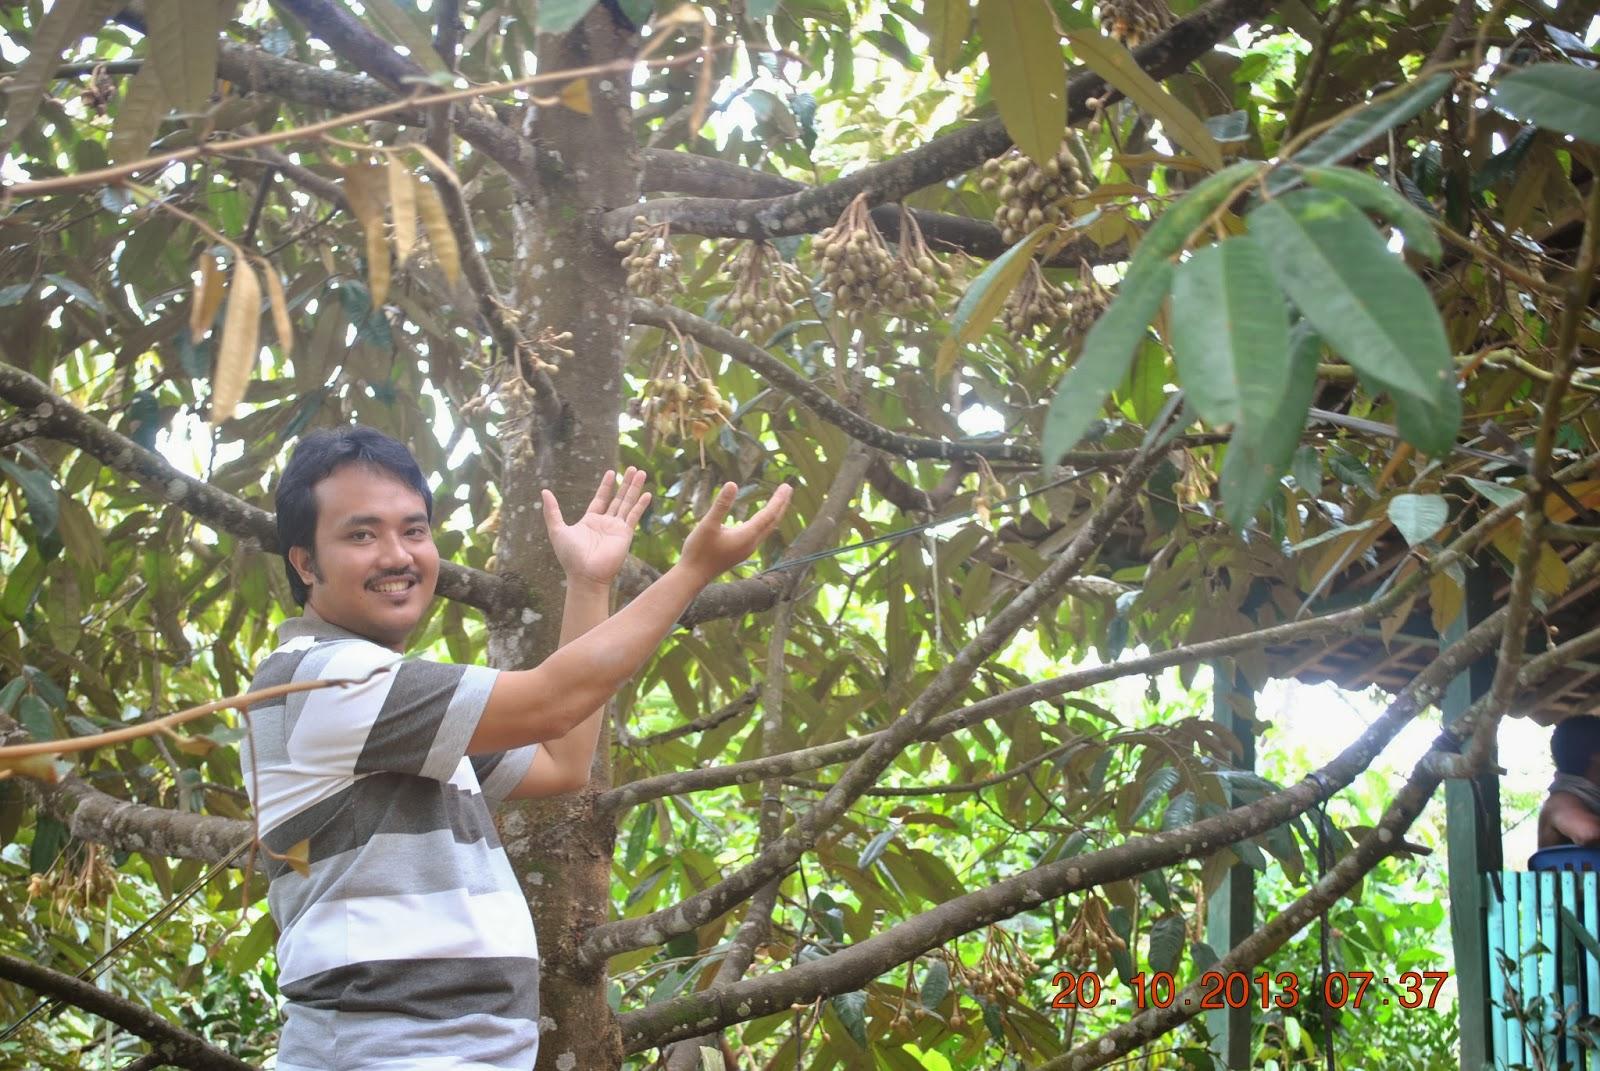 Pohon Durian Menoreh Kuning; Pendek. kokoh, Eksotis, indah, dan produktif